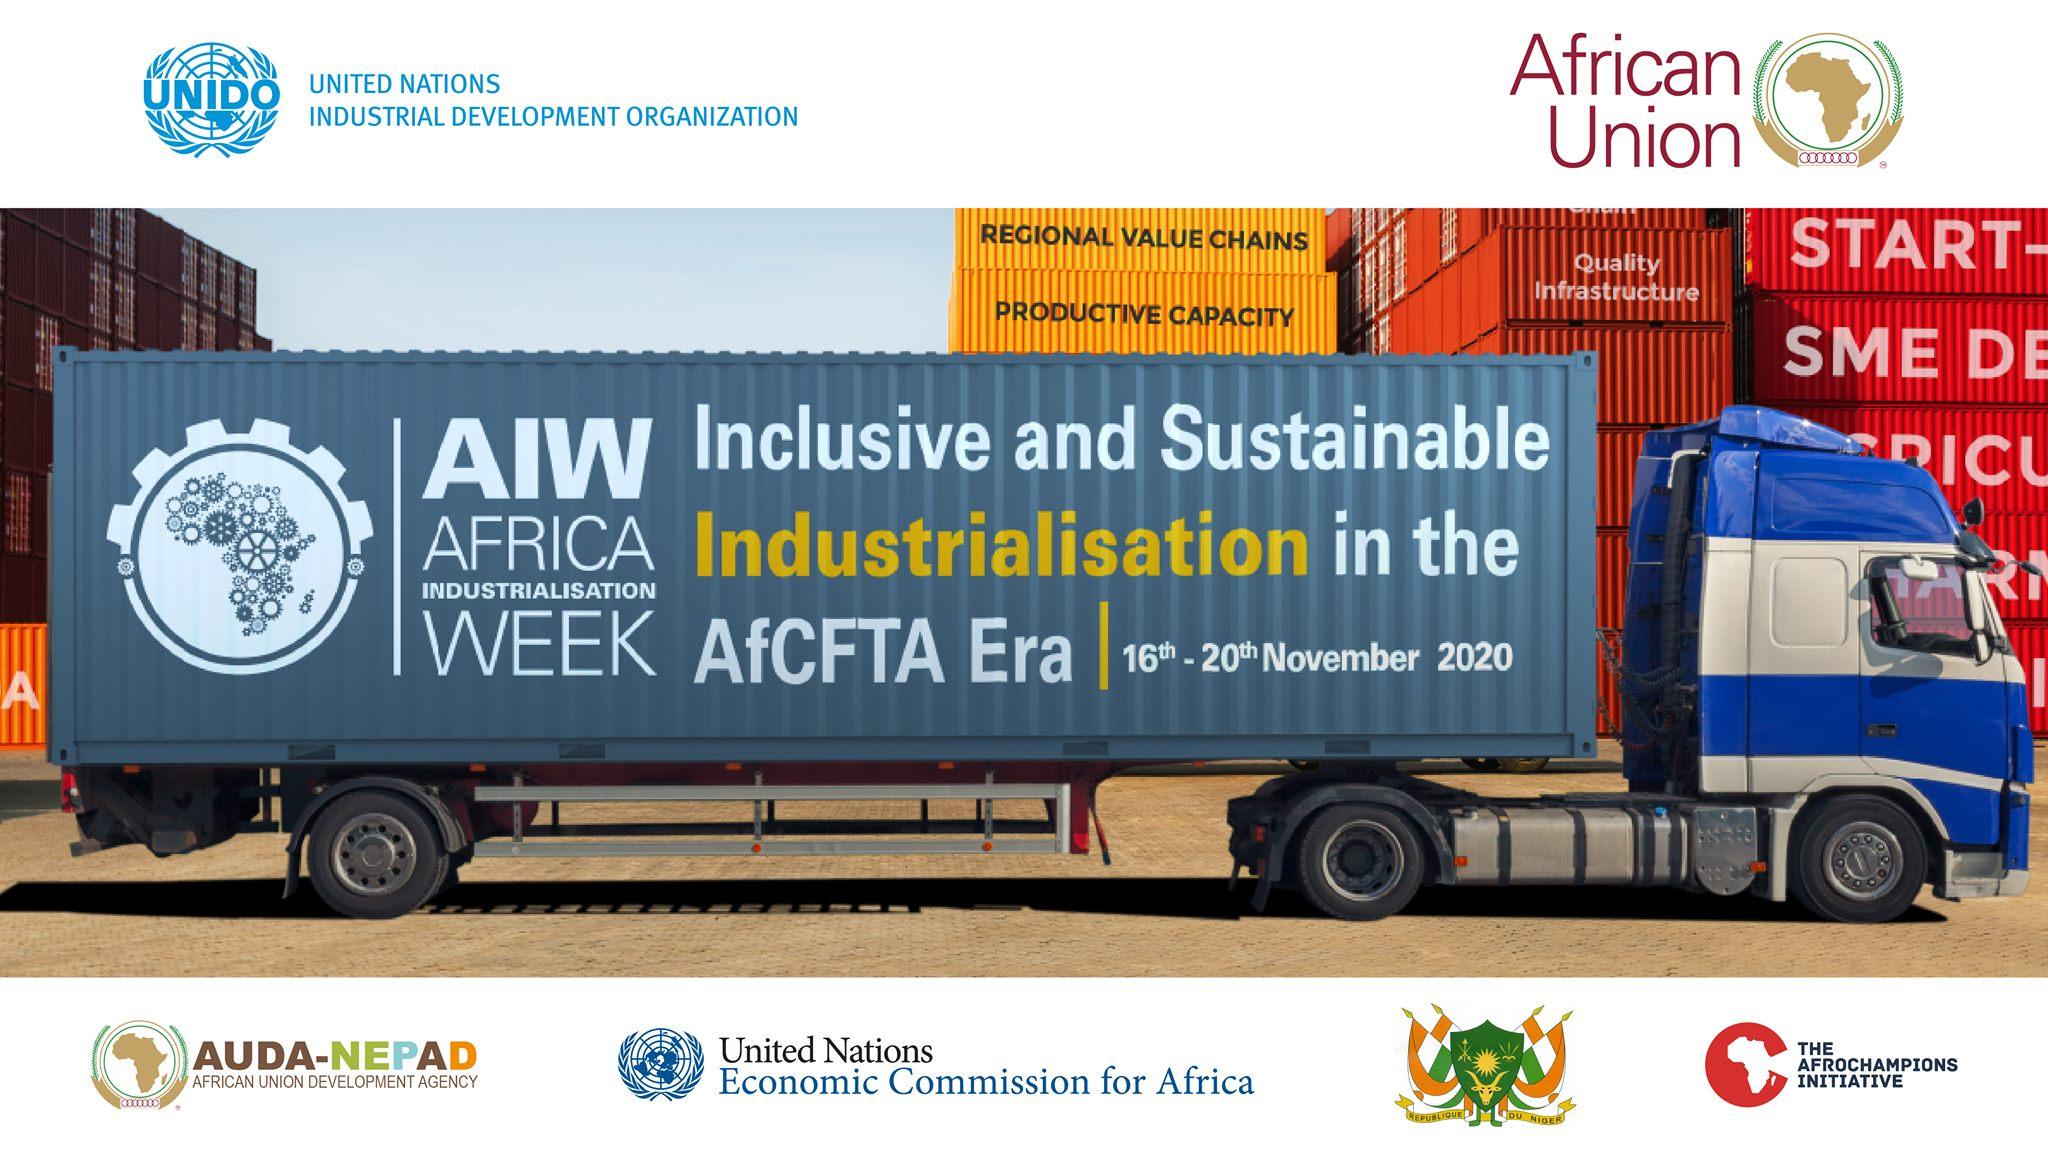 Africa Industrialisation Week 2020